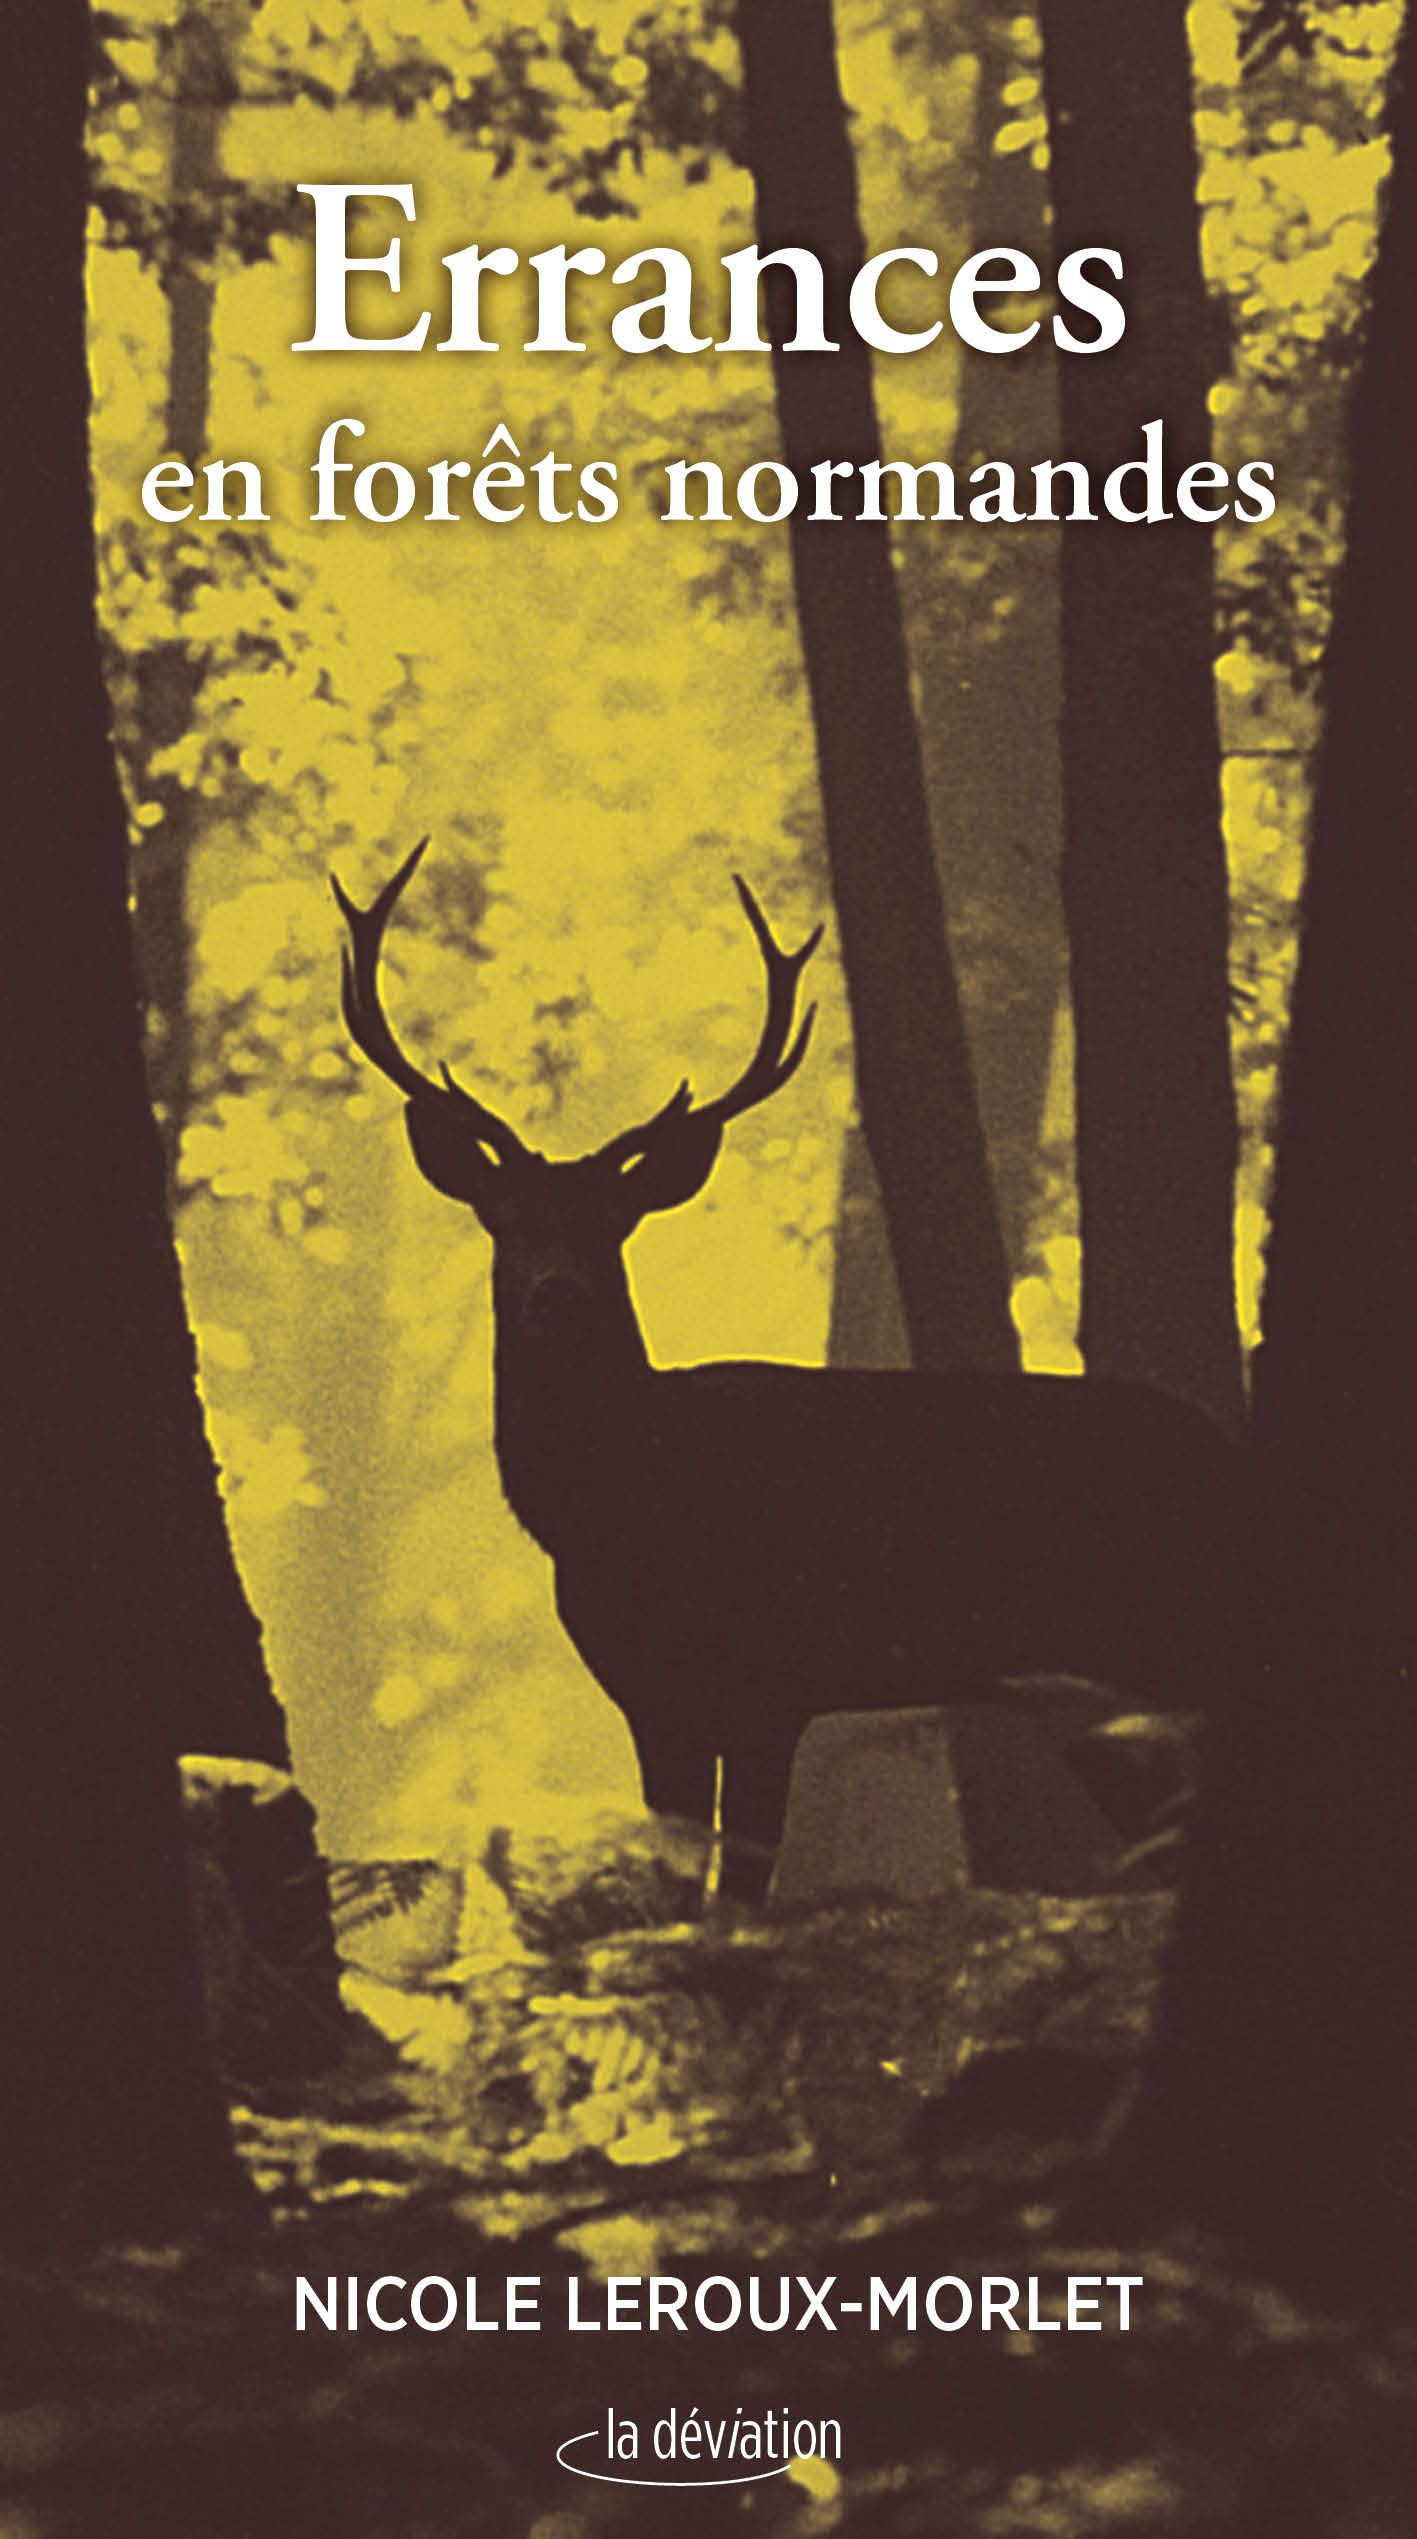 Errances en forêts normandes